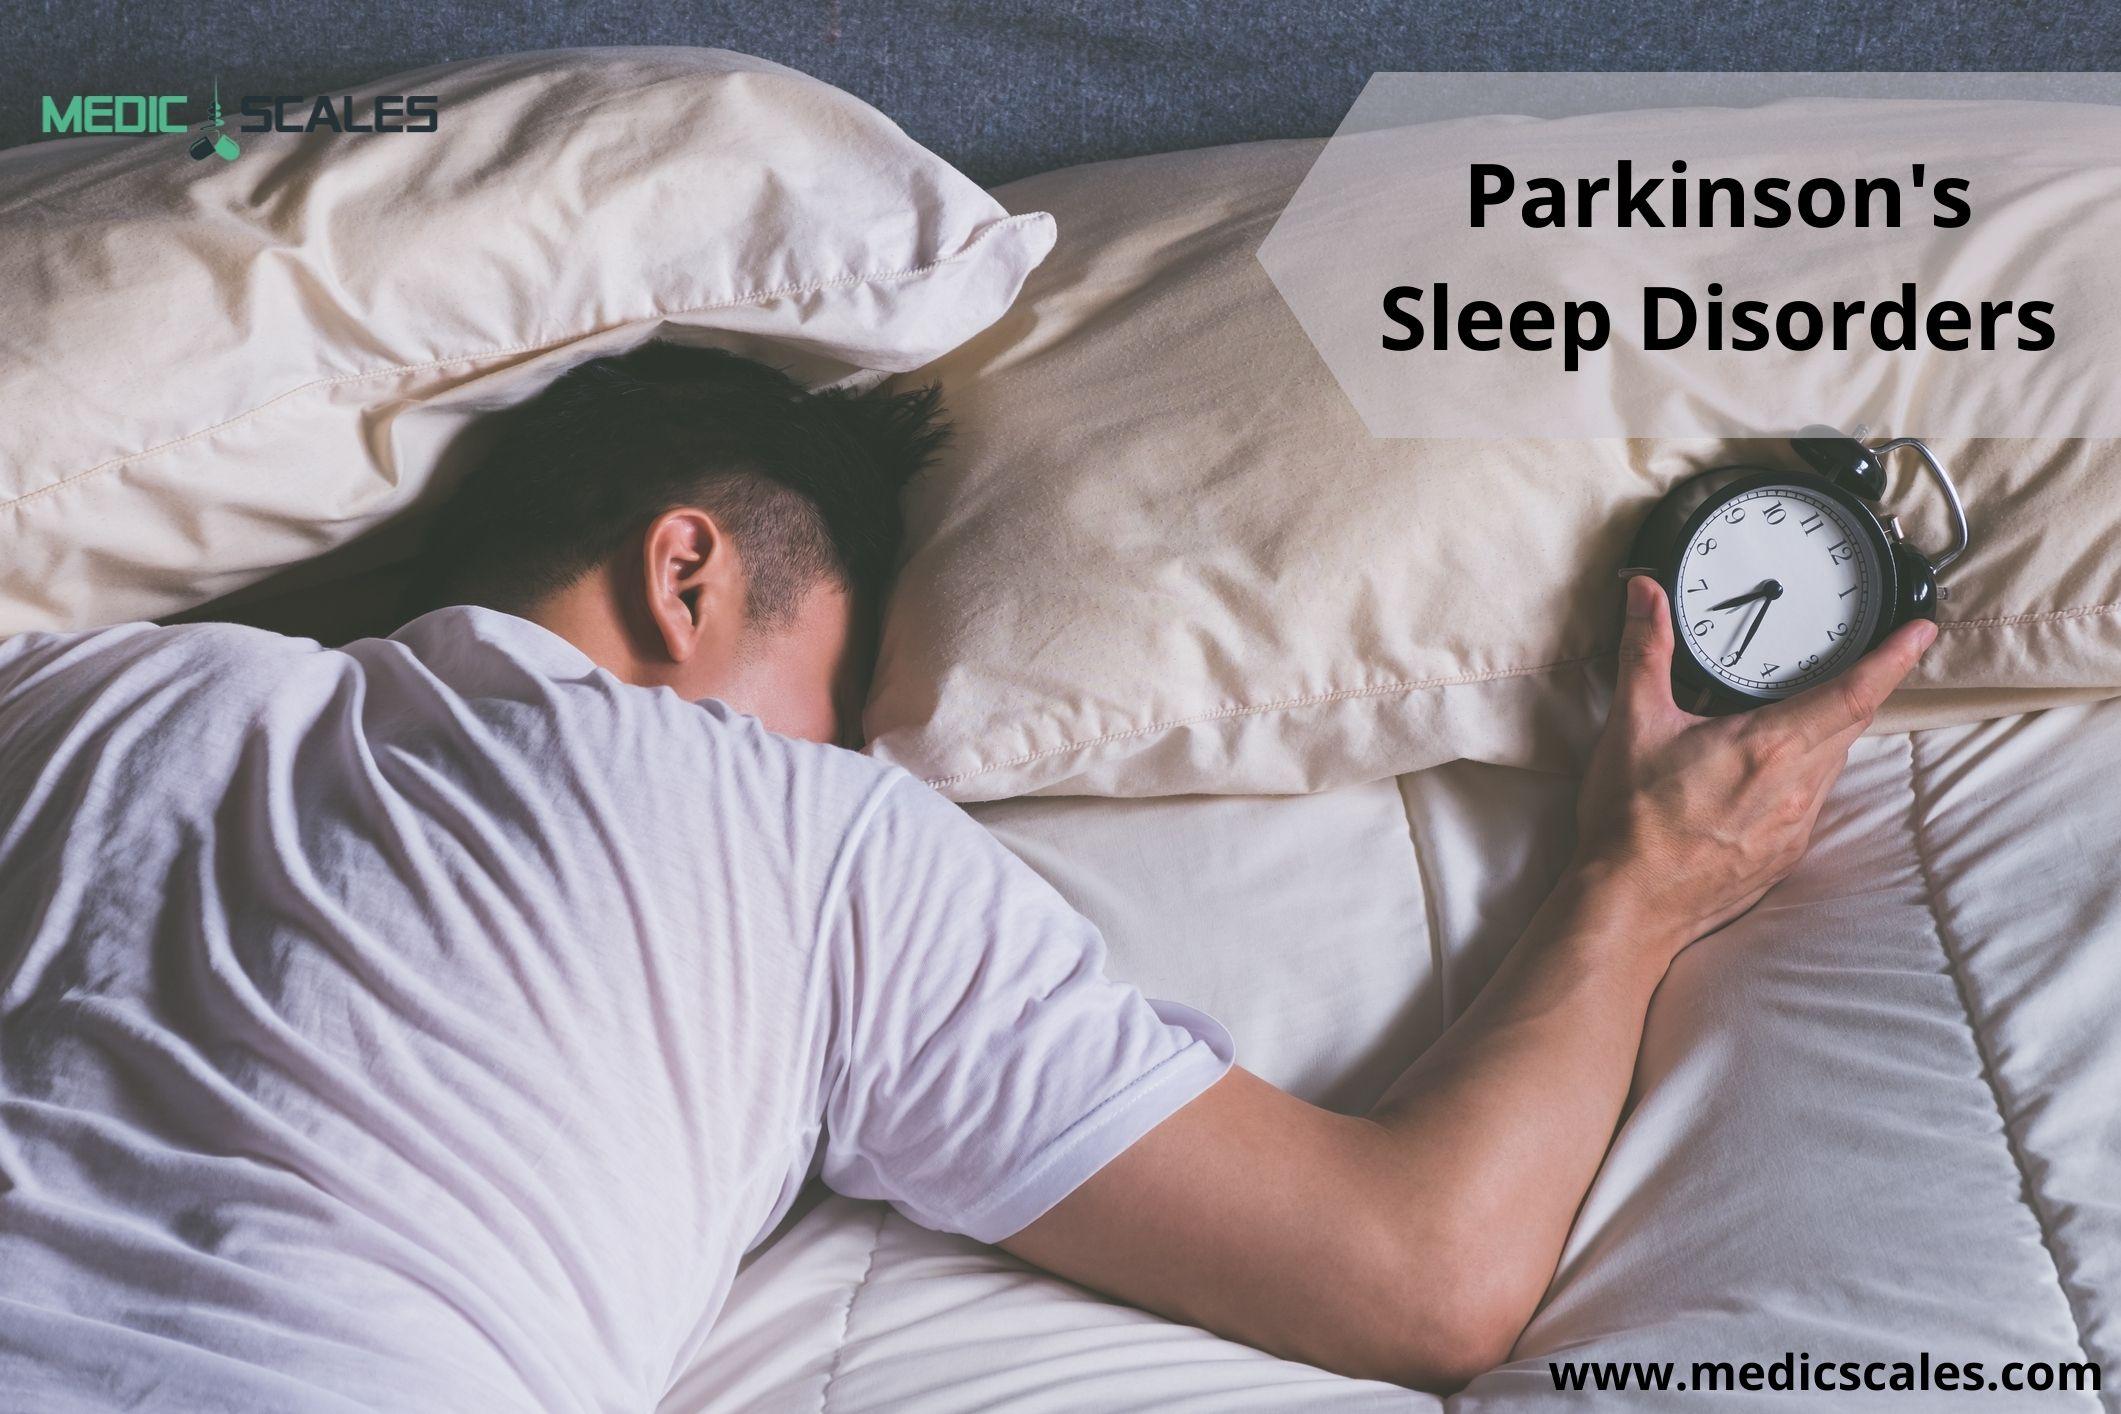 Parkinson's Sleep Disorders